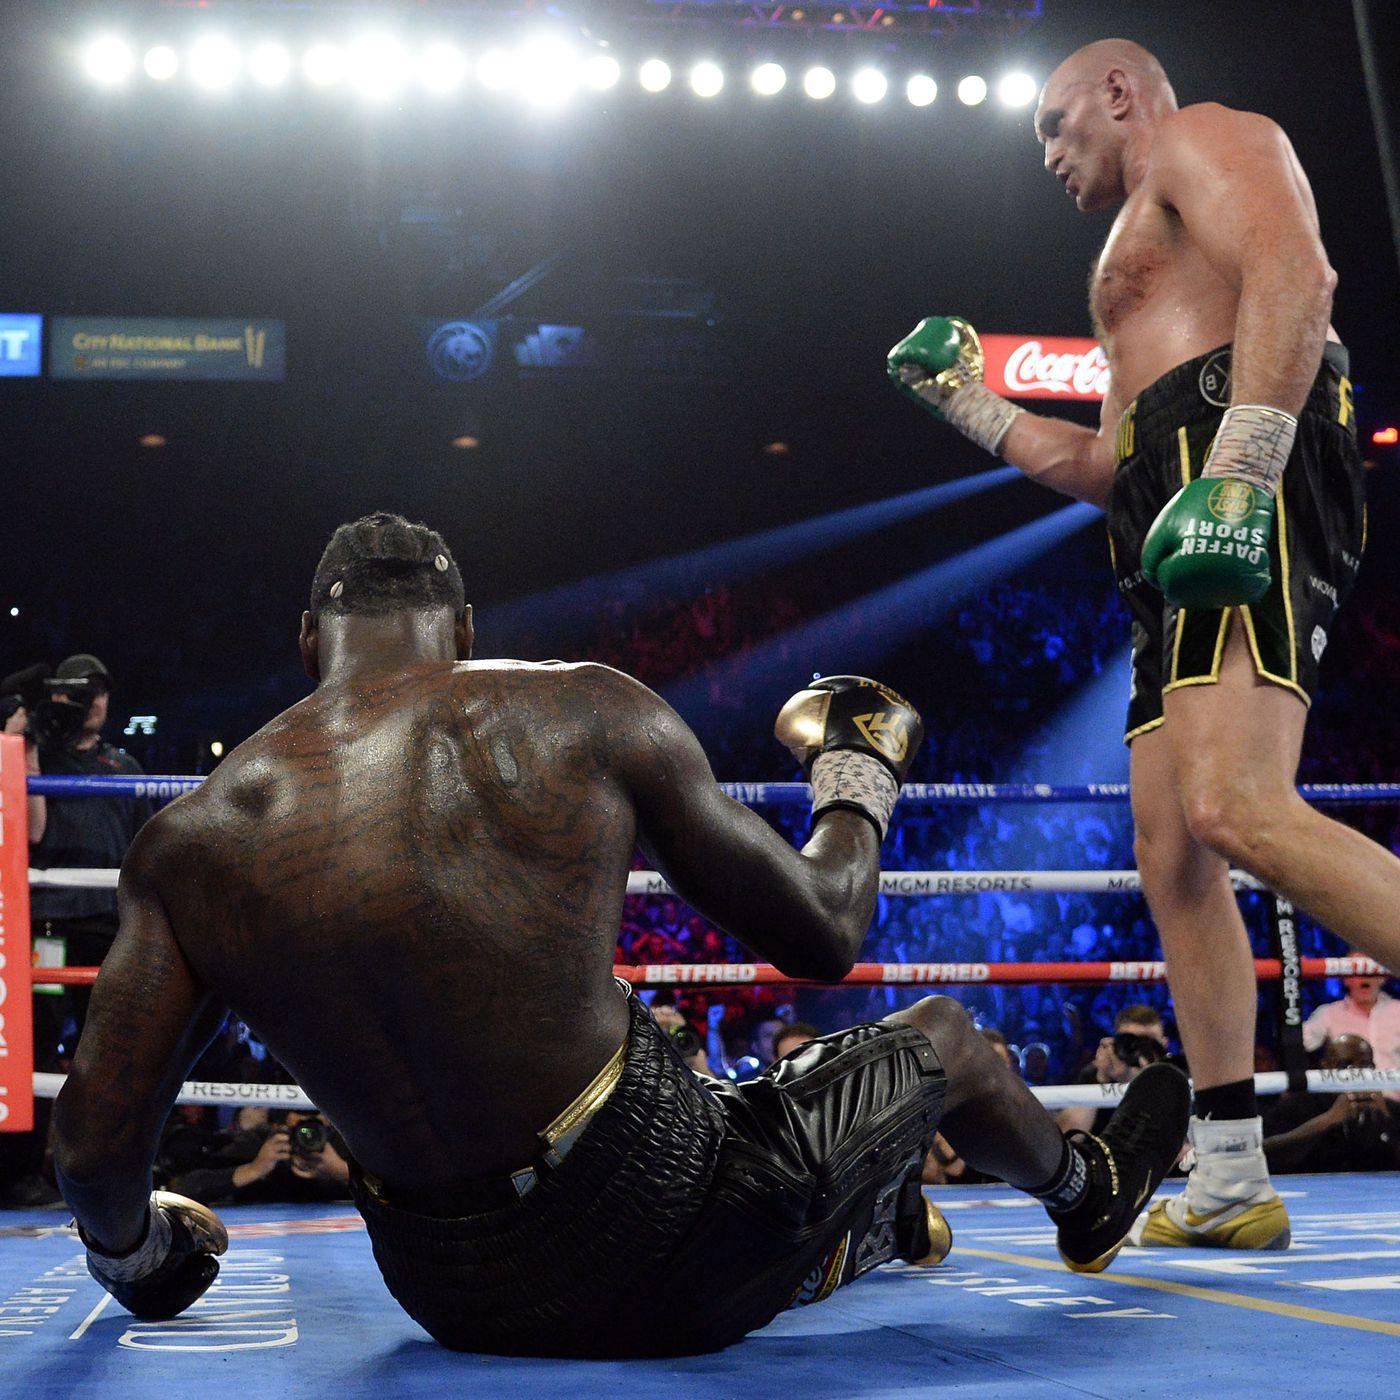 Tyson Fury against Deontay Wilder